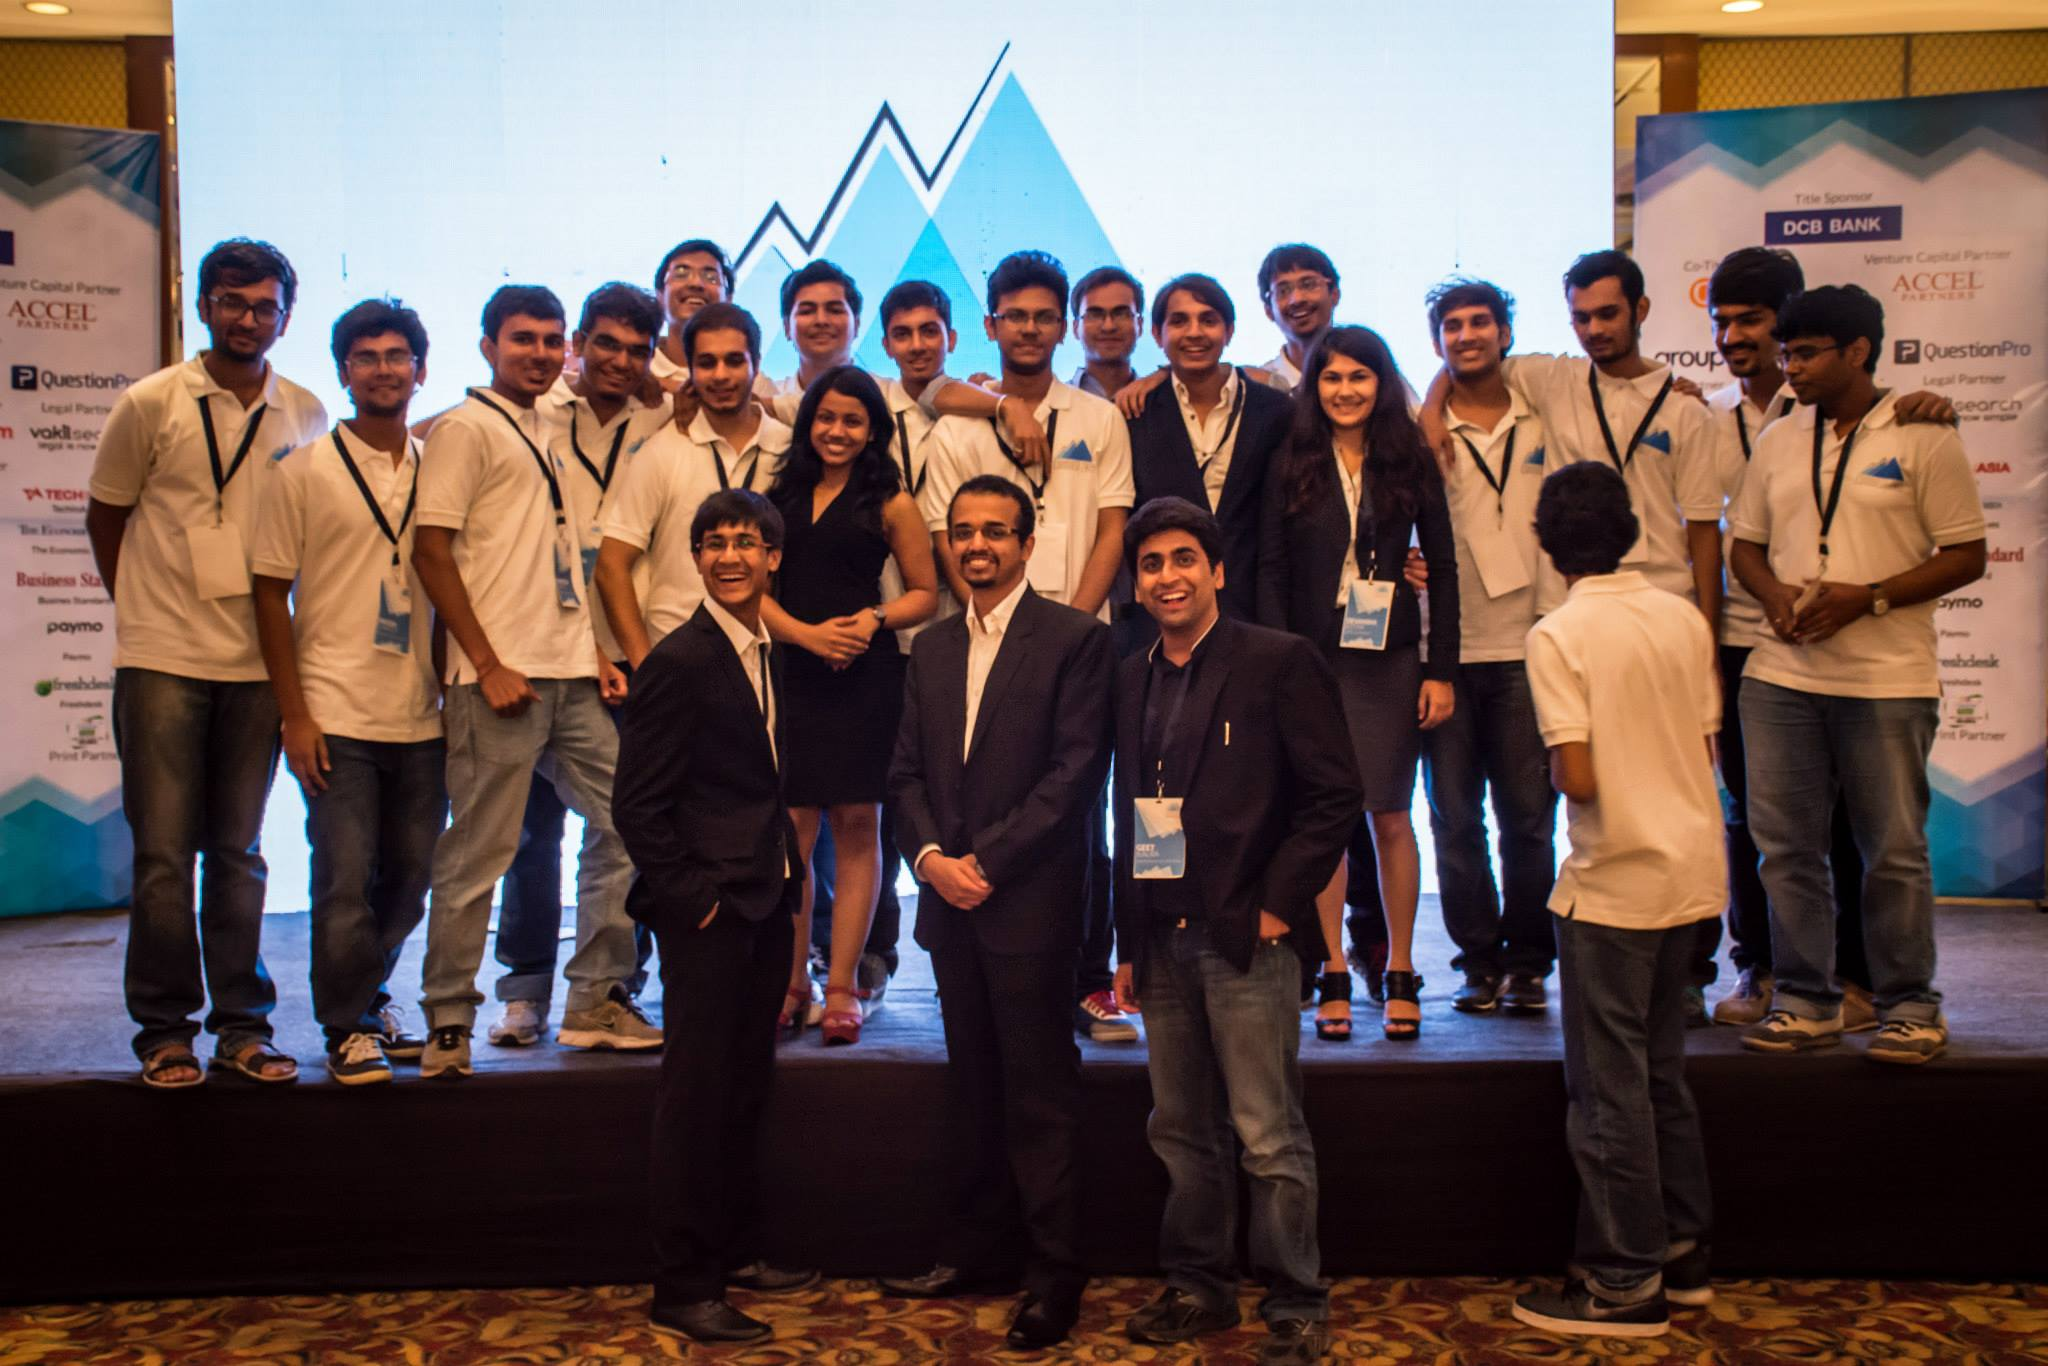 startups conquest 2016